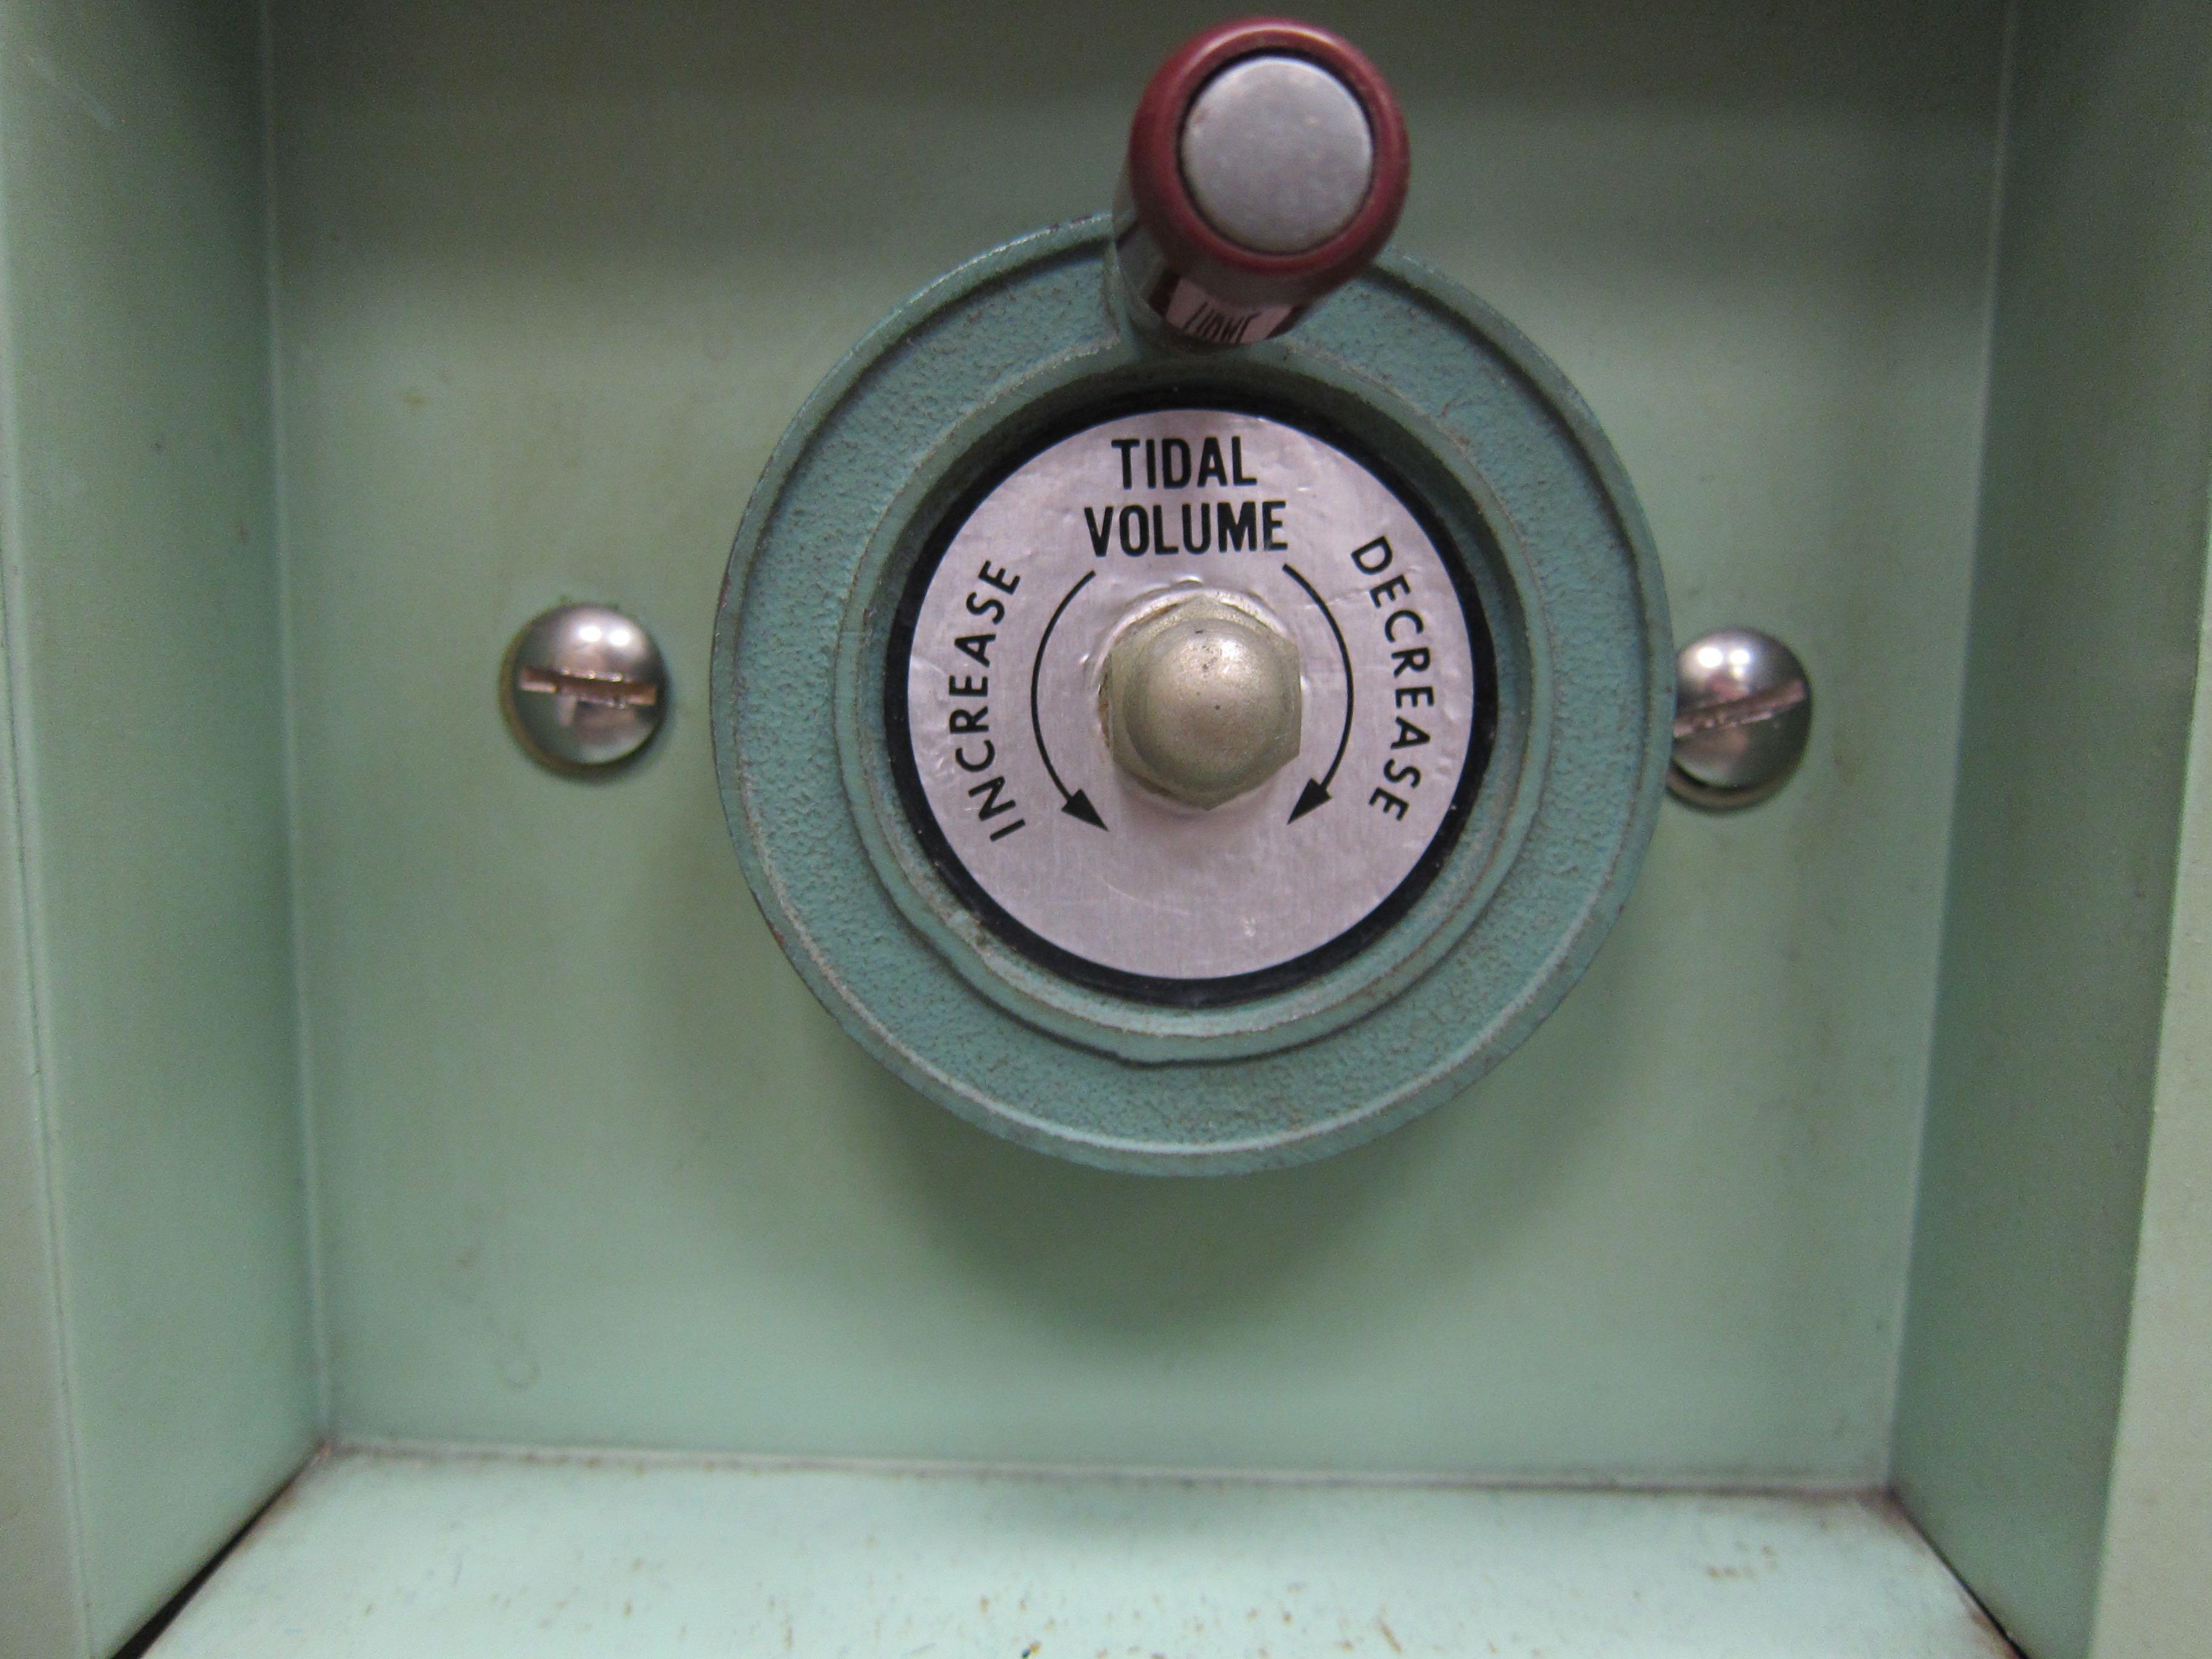 Emerson Tidal Volume Control